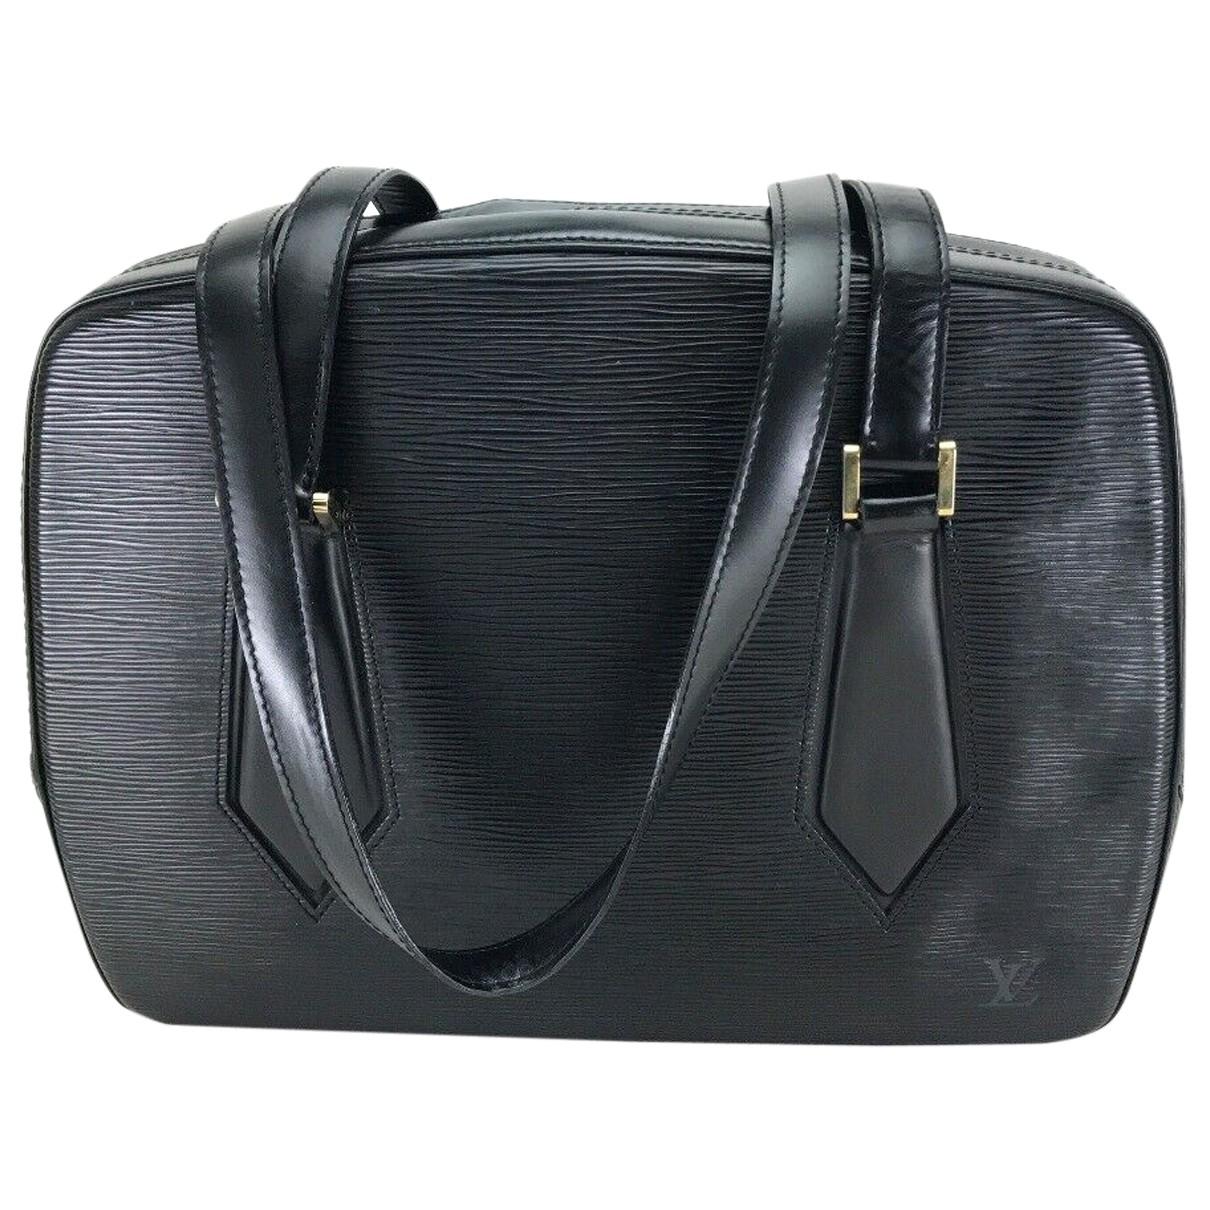 Louis Vuitton N Black Leather handbag for Women N